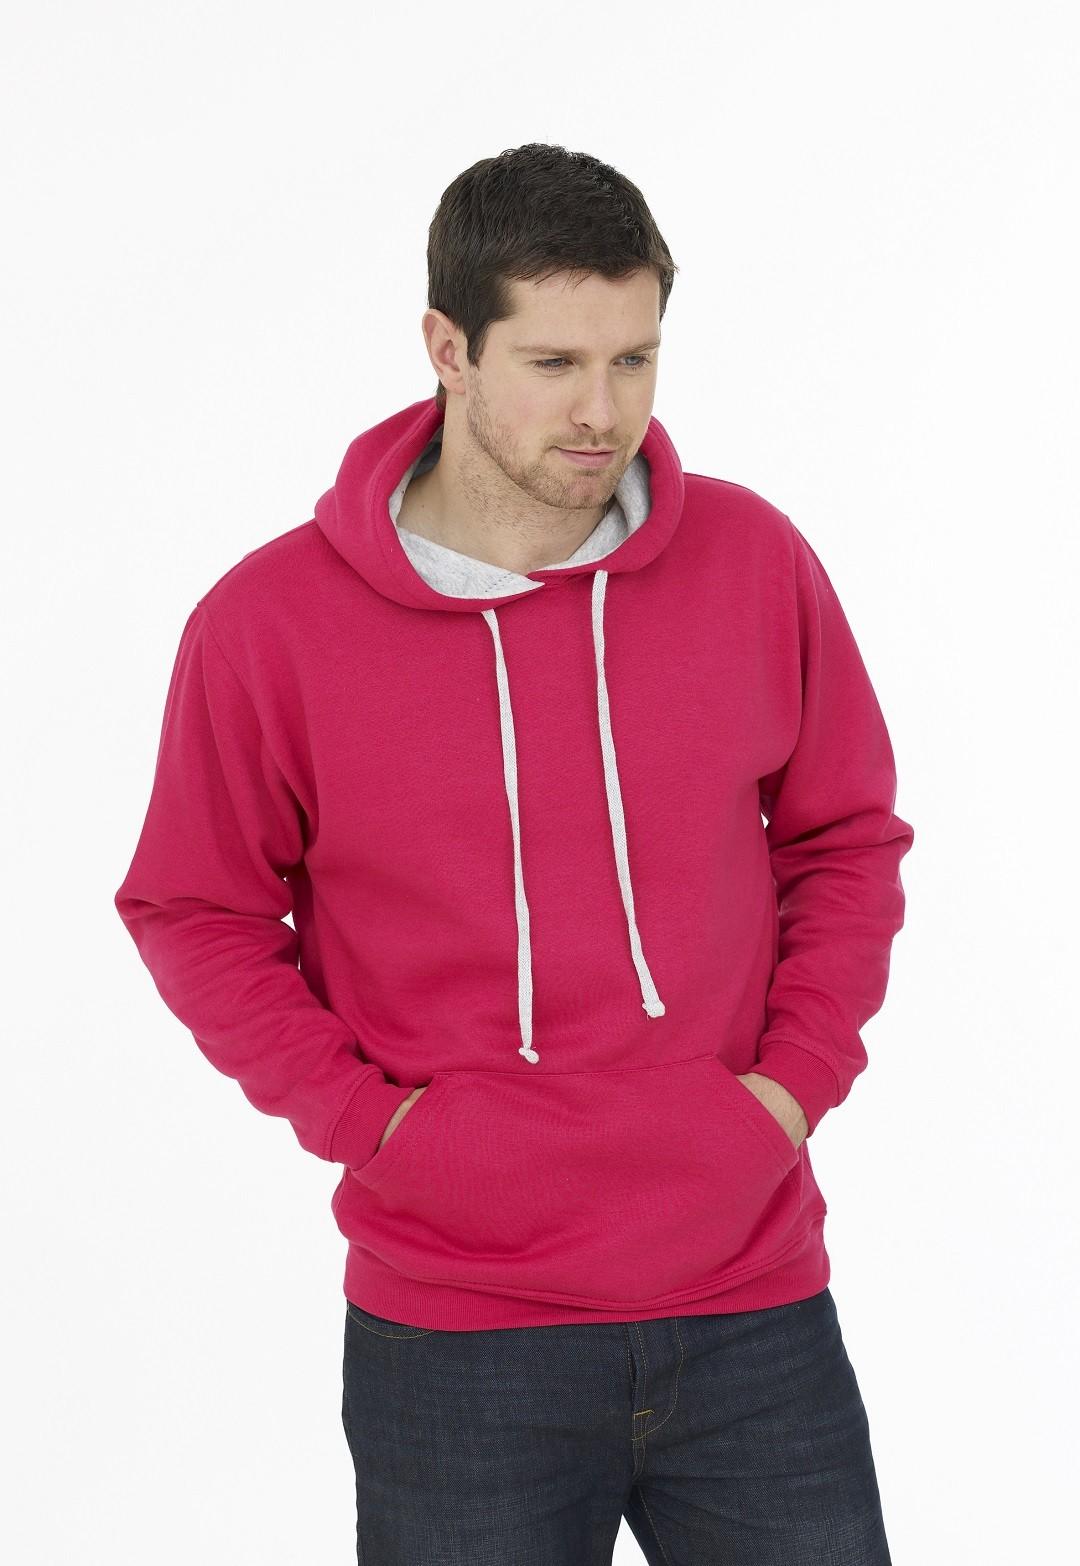 Unisex Contrast Hooded Sweatshirt